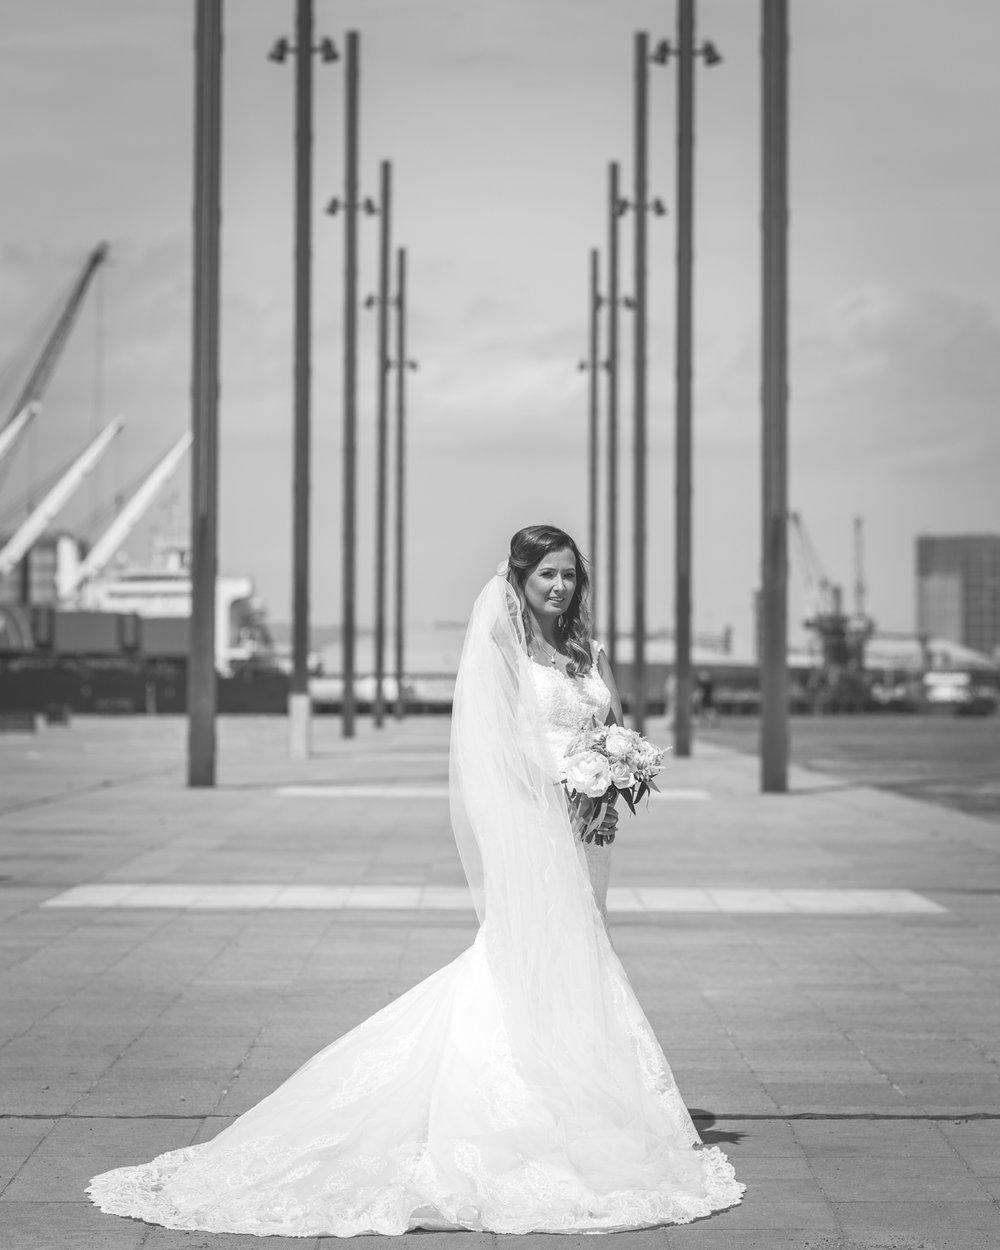 Brian McEwan | Northern Ireland Wedding Photographer | Rebecca & Michael | Portraits-43.jpg